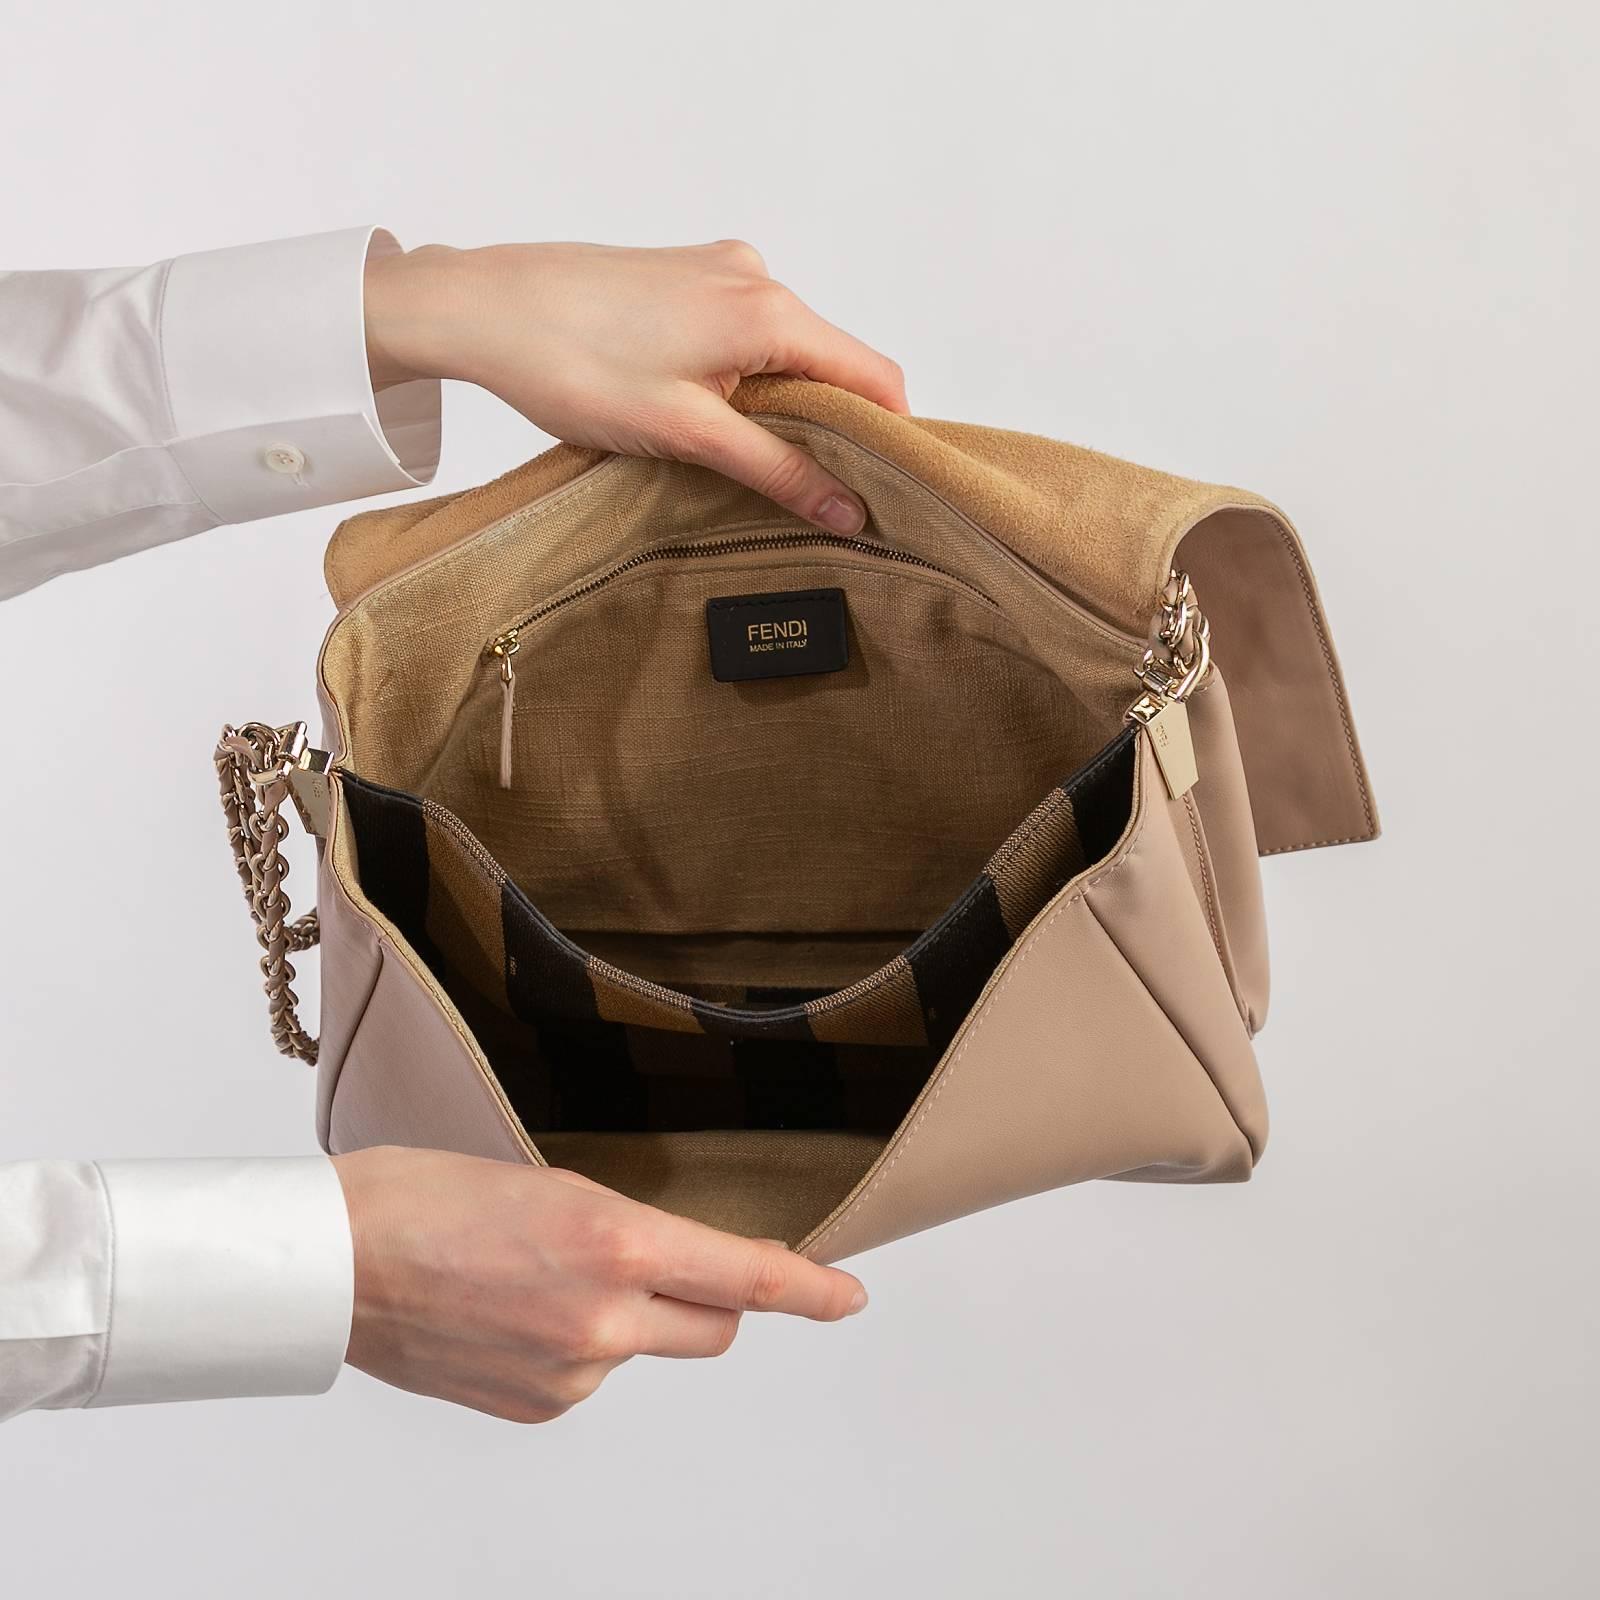 сумка фенди багет купить